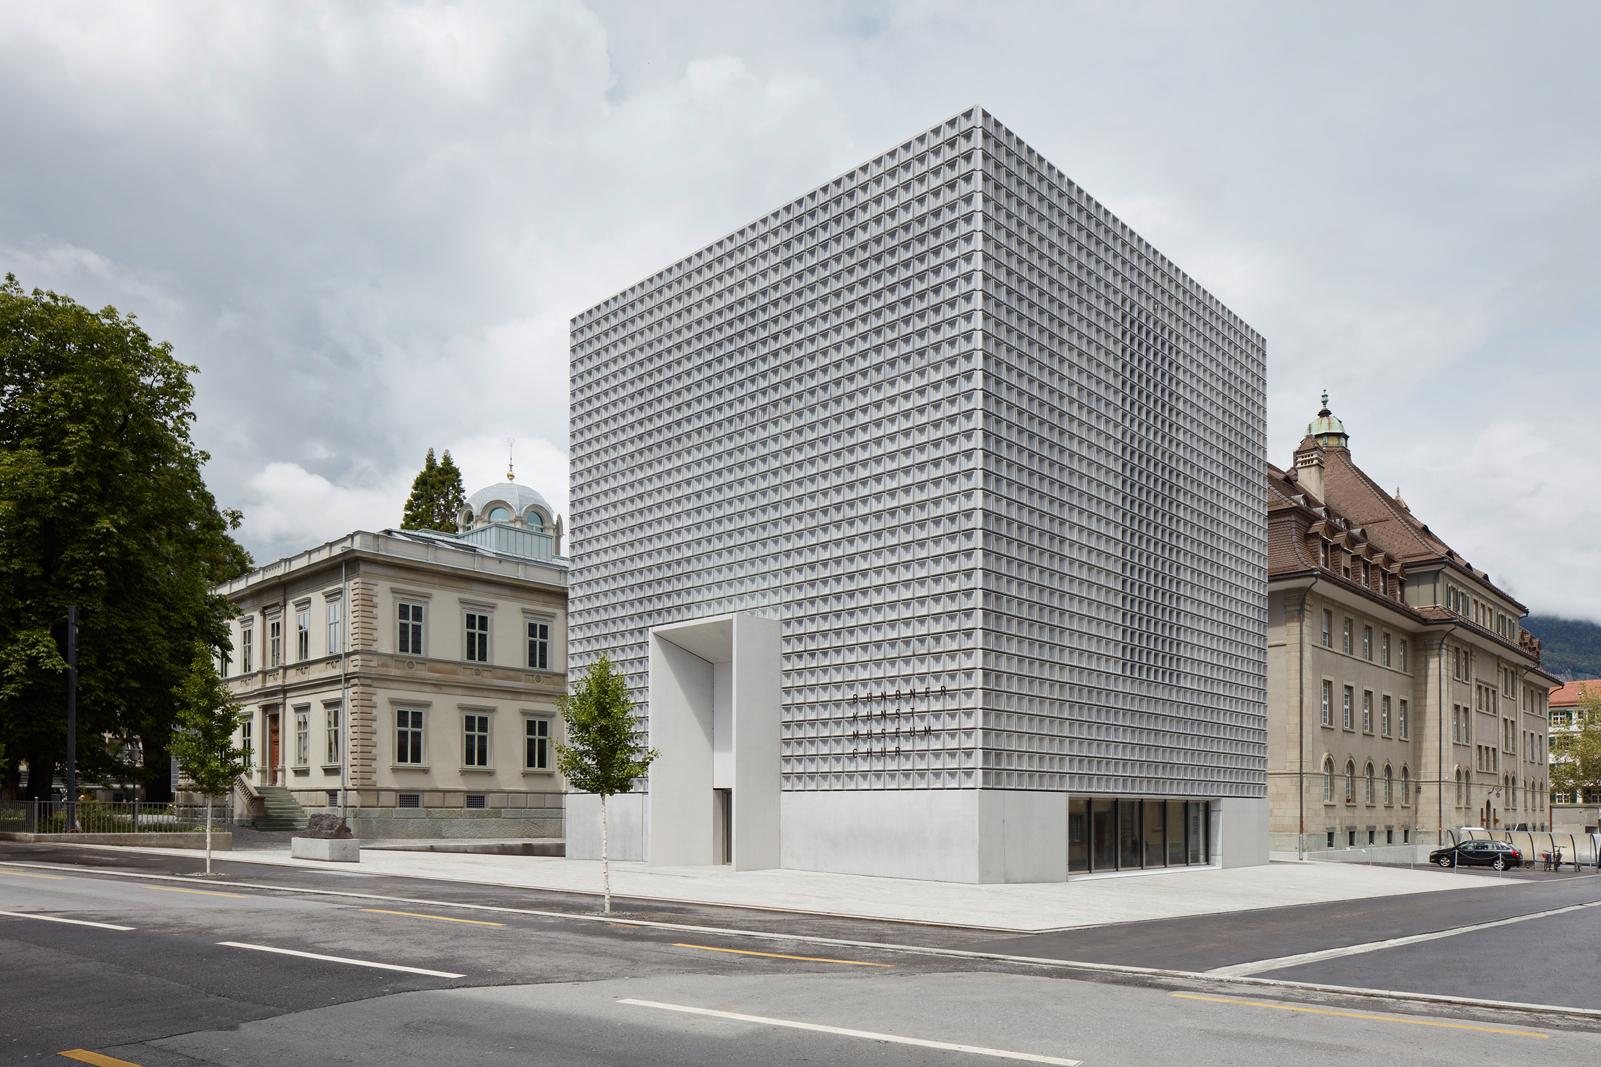 kunstmuseum-chur-003